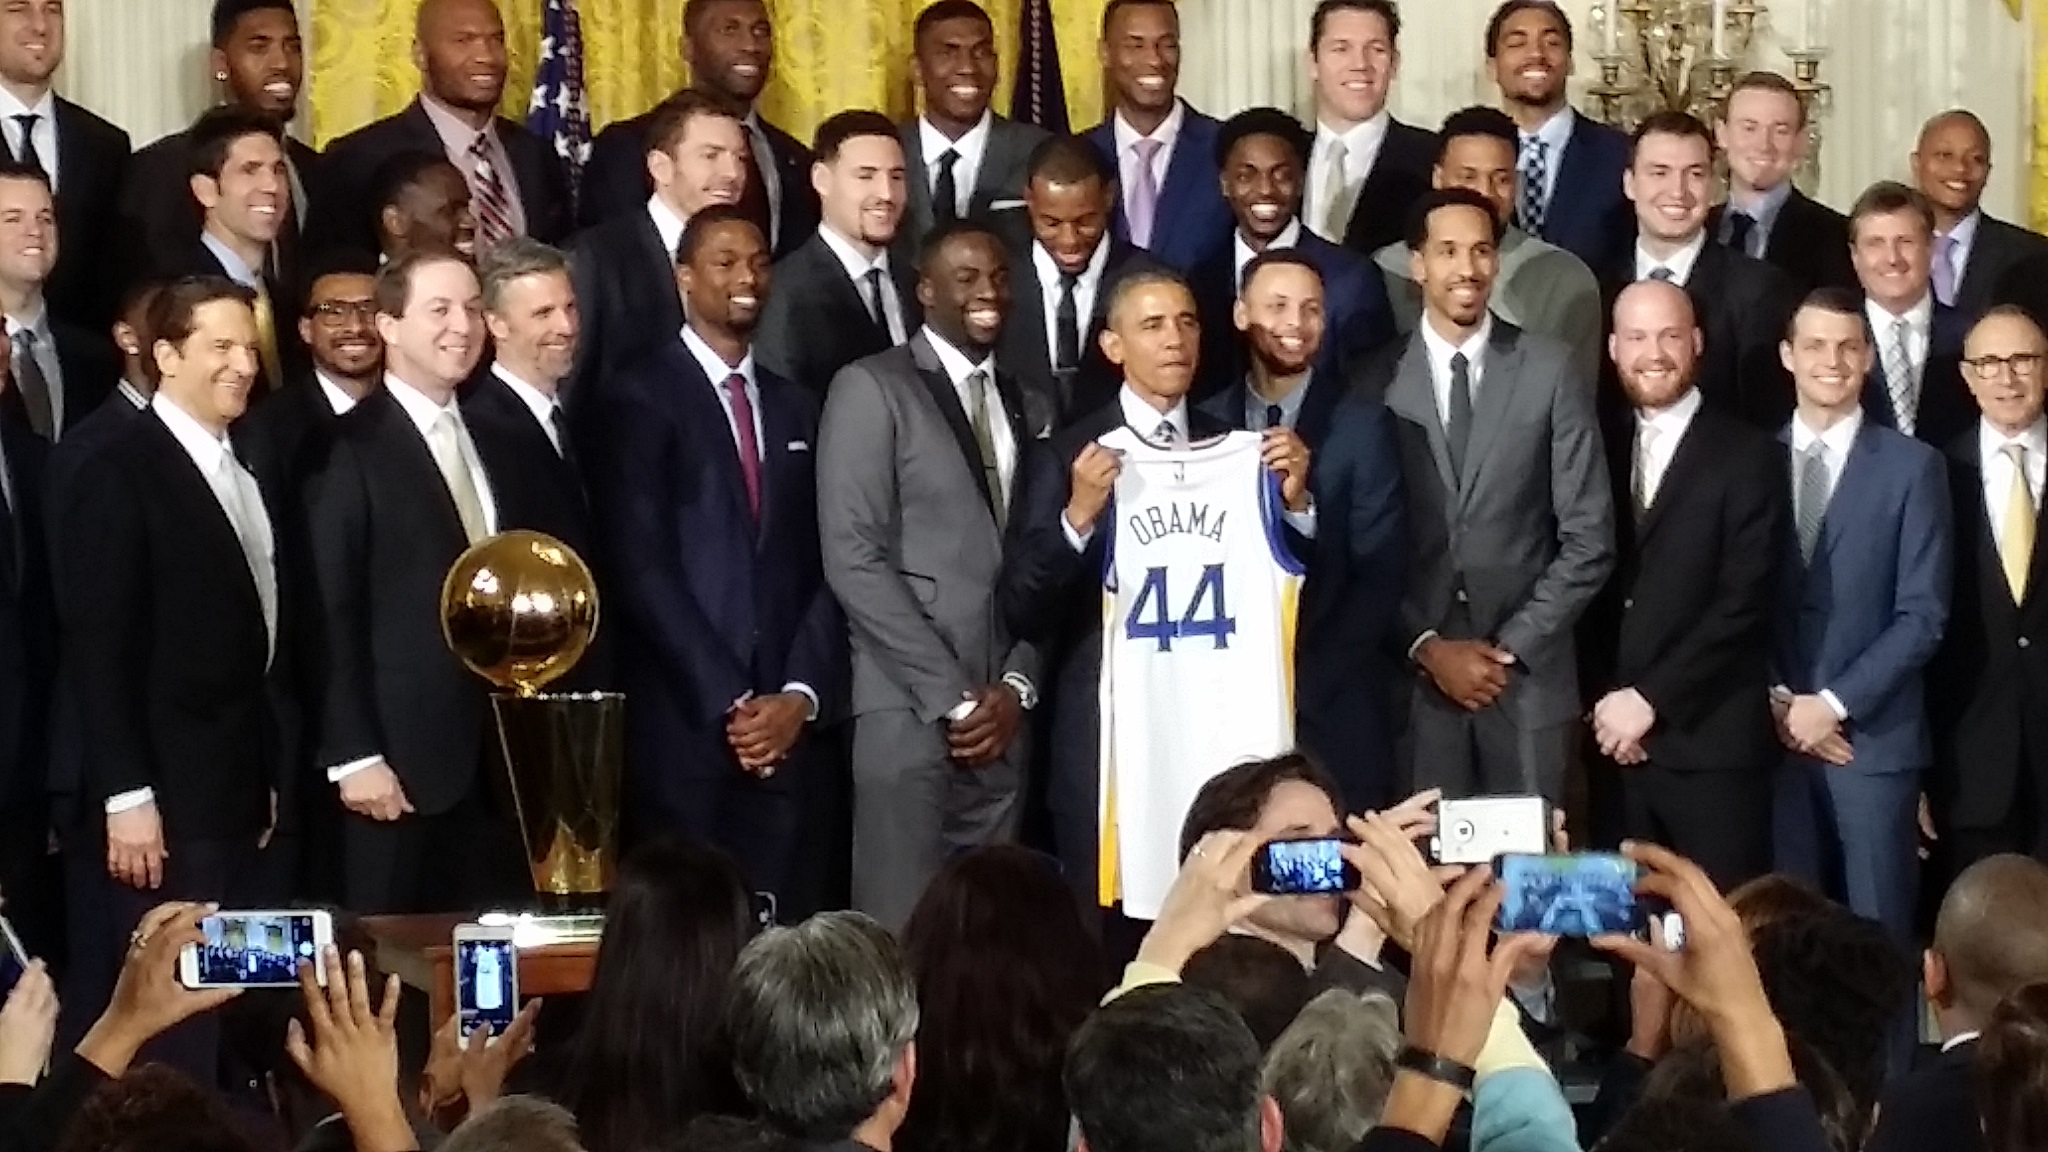 Golden State Warriors visit White House